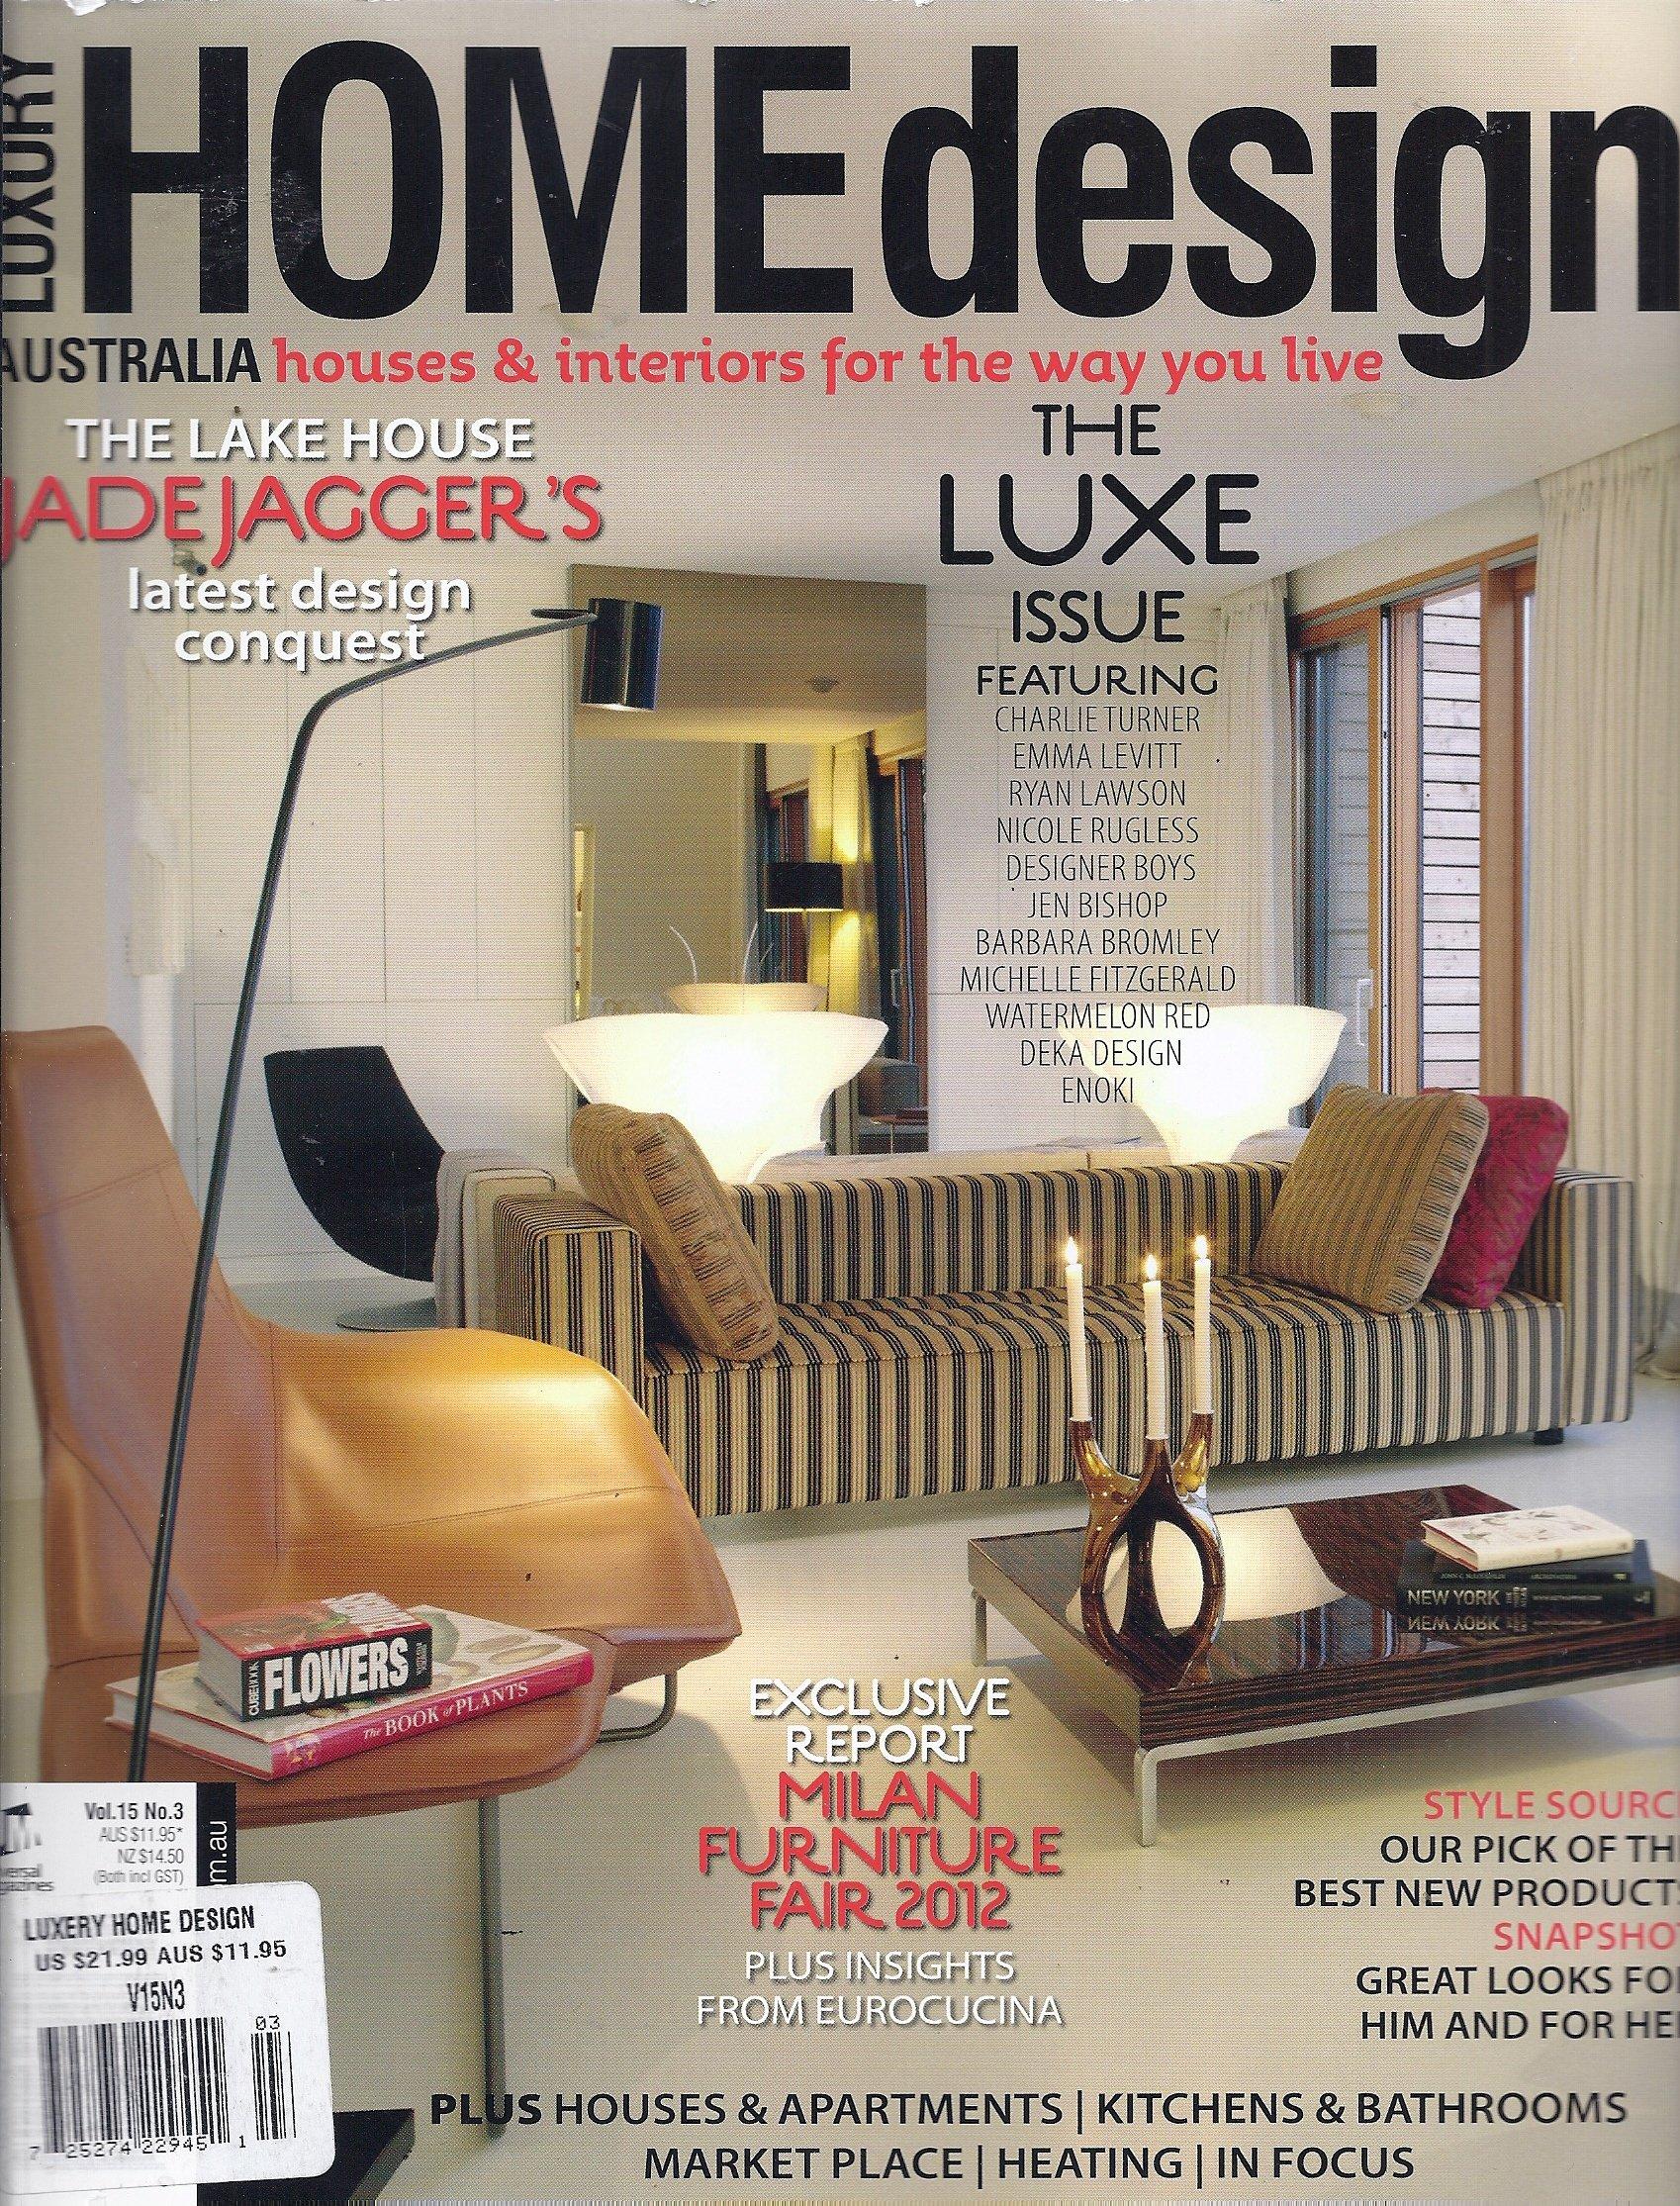 Luxury Home Design Vol 15 No 3 Australia Edition Kate St James Amazon Com Books